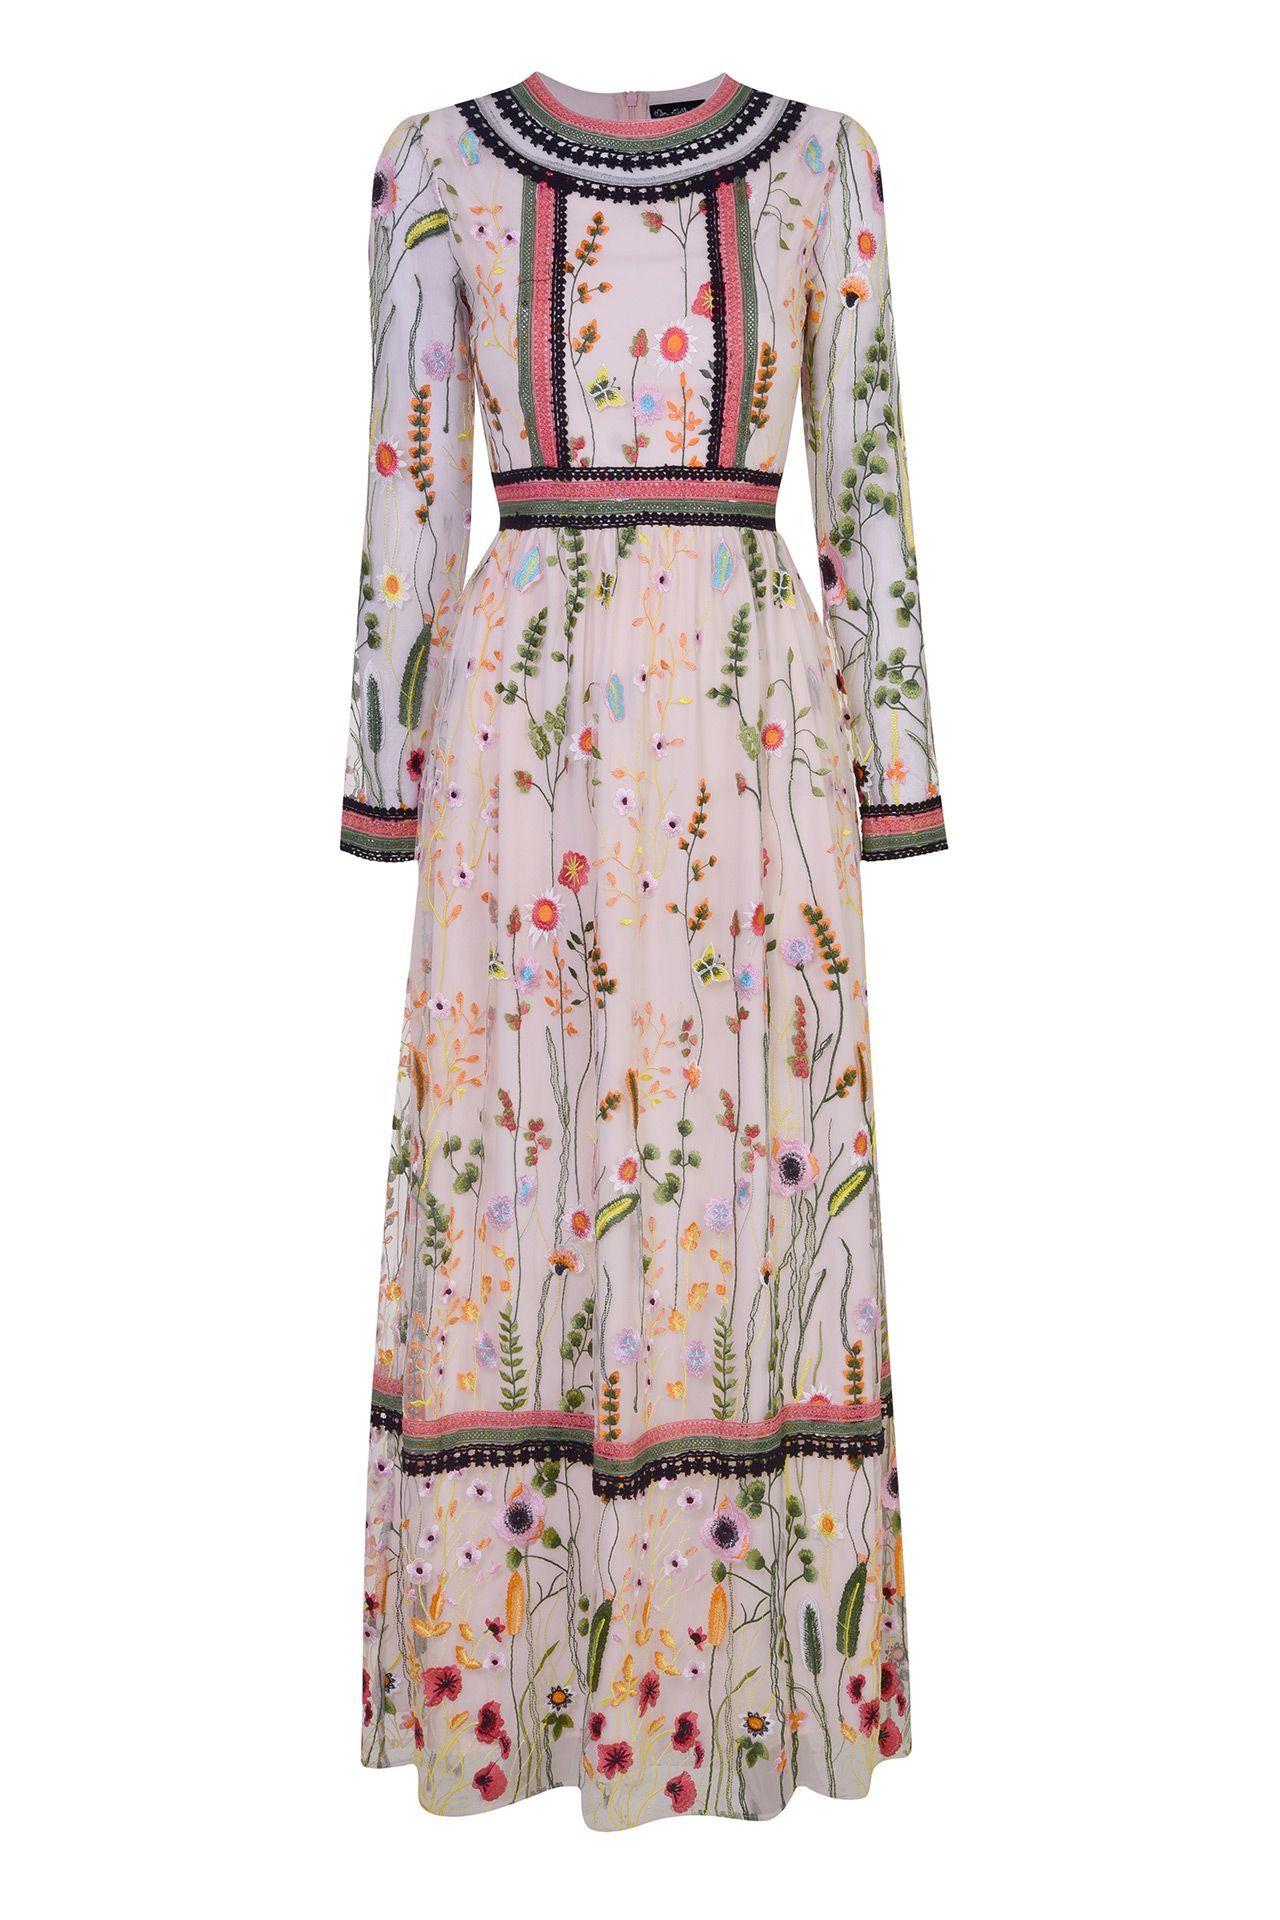 2cc673ec3c47 Georgette Ruffle Maxi Dress by Borgo de Nor Resort 2019 | Vacation Wardrobe  in 2019 | Dresses, Dress outfits, Fashion